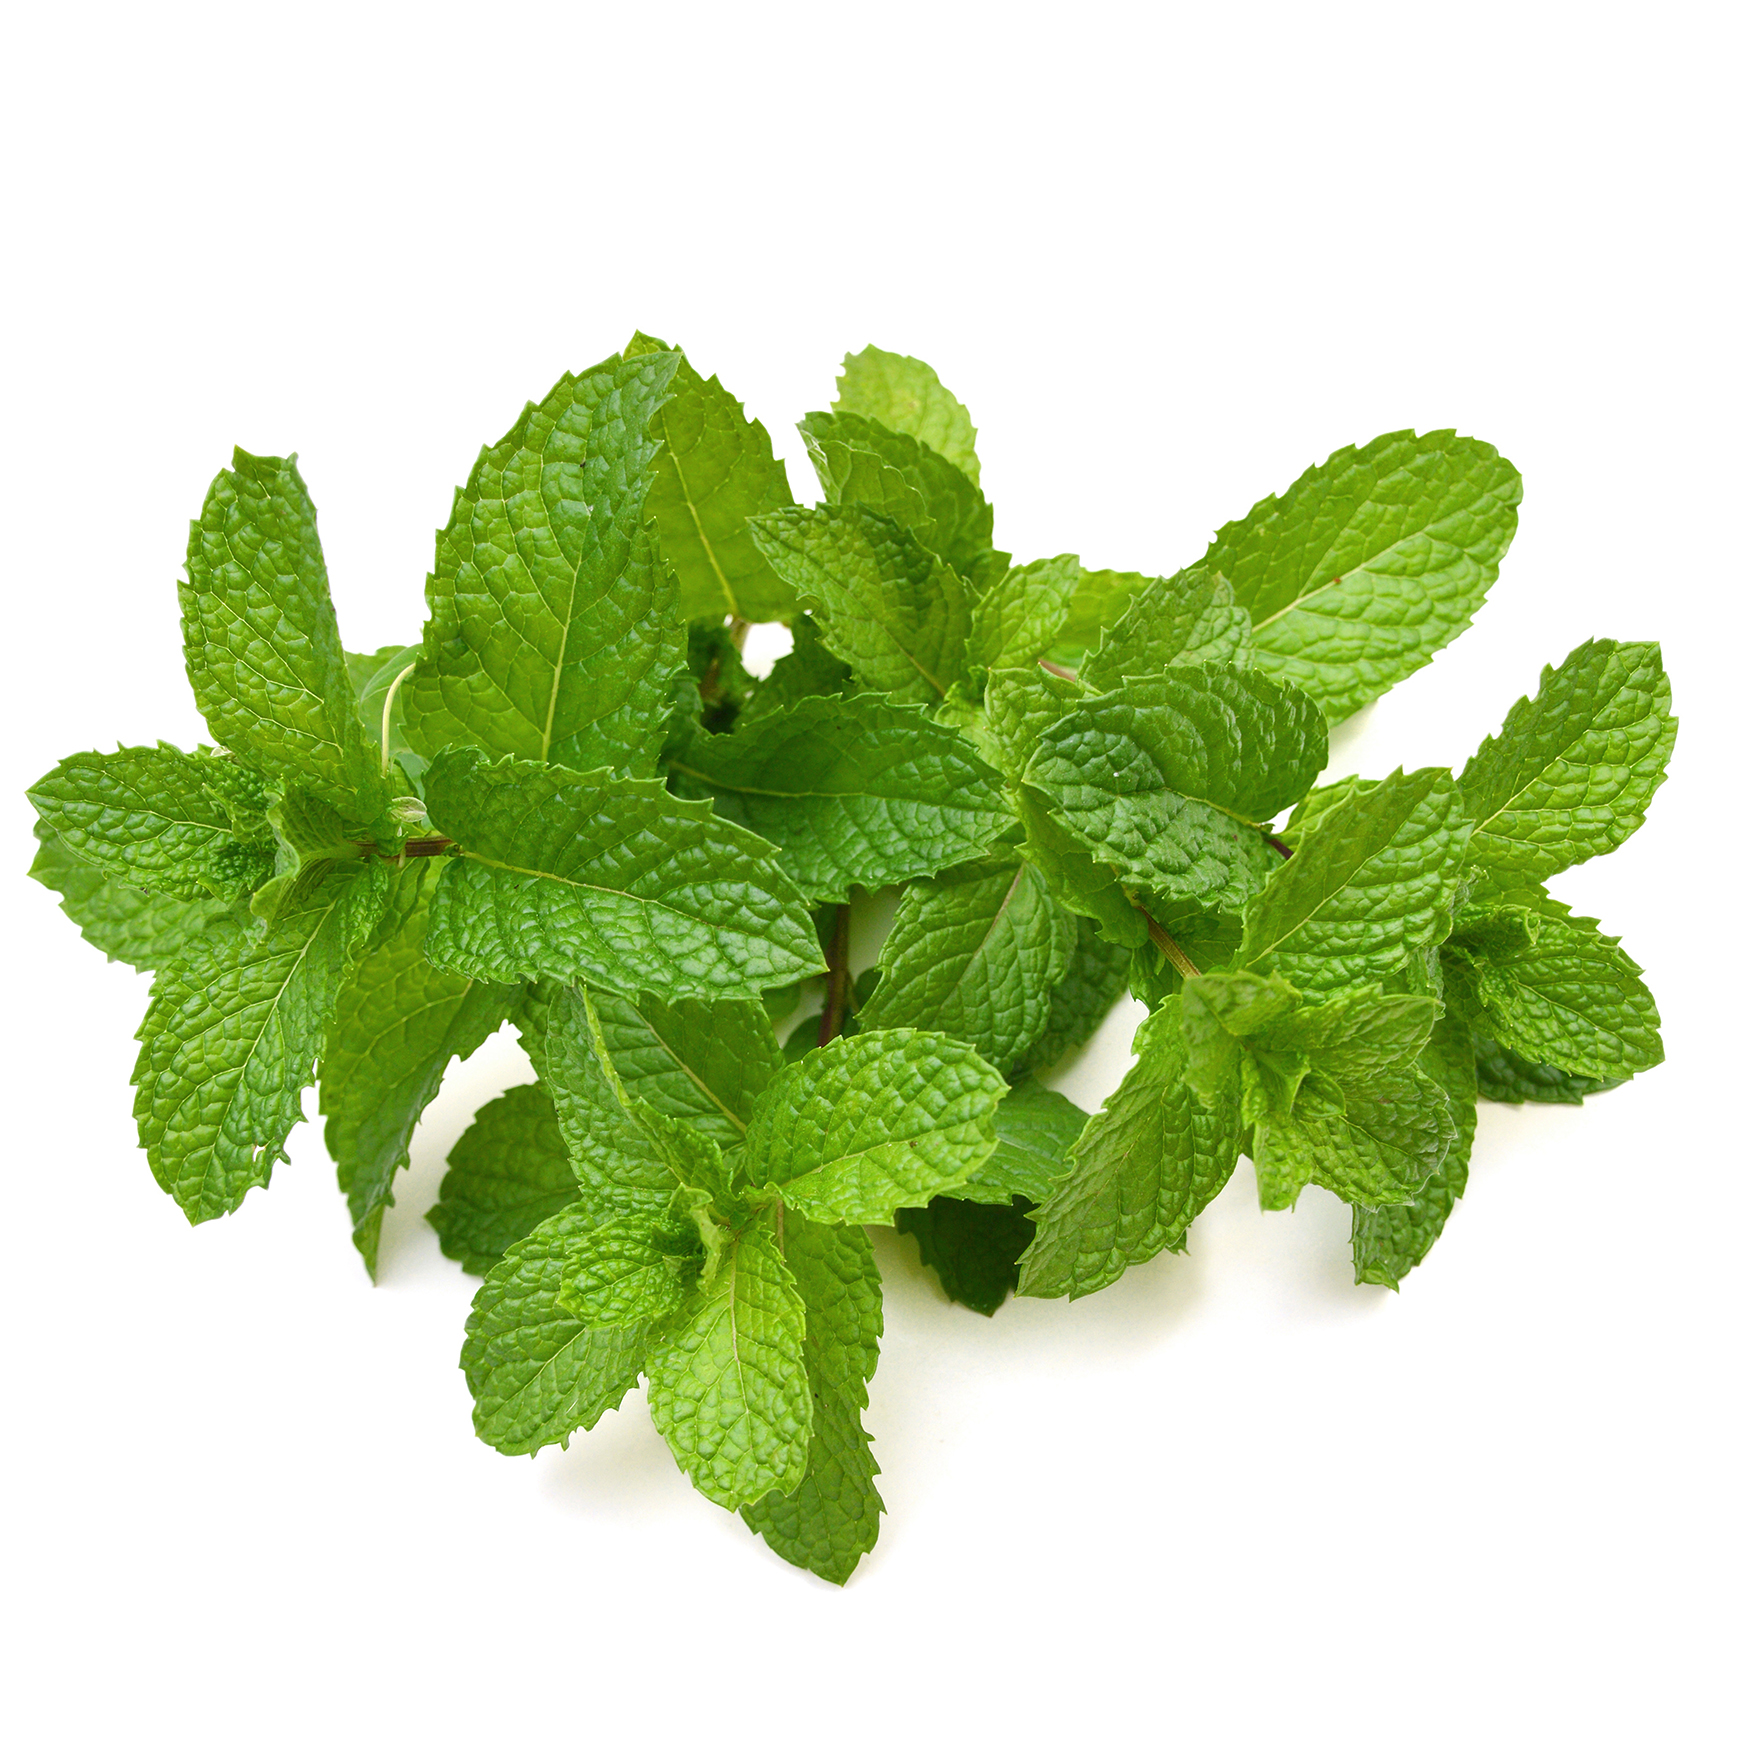 Mint (Pudina)